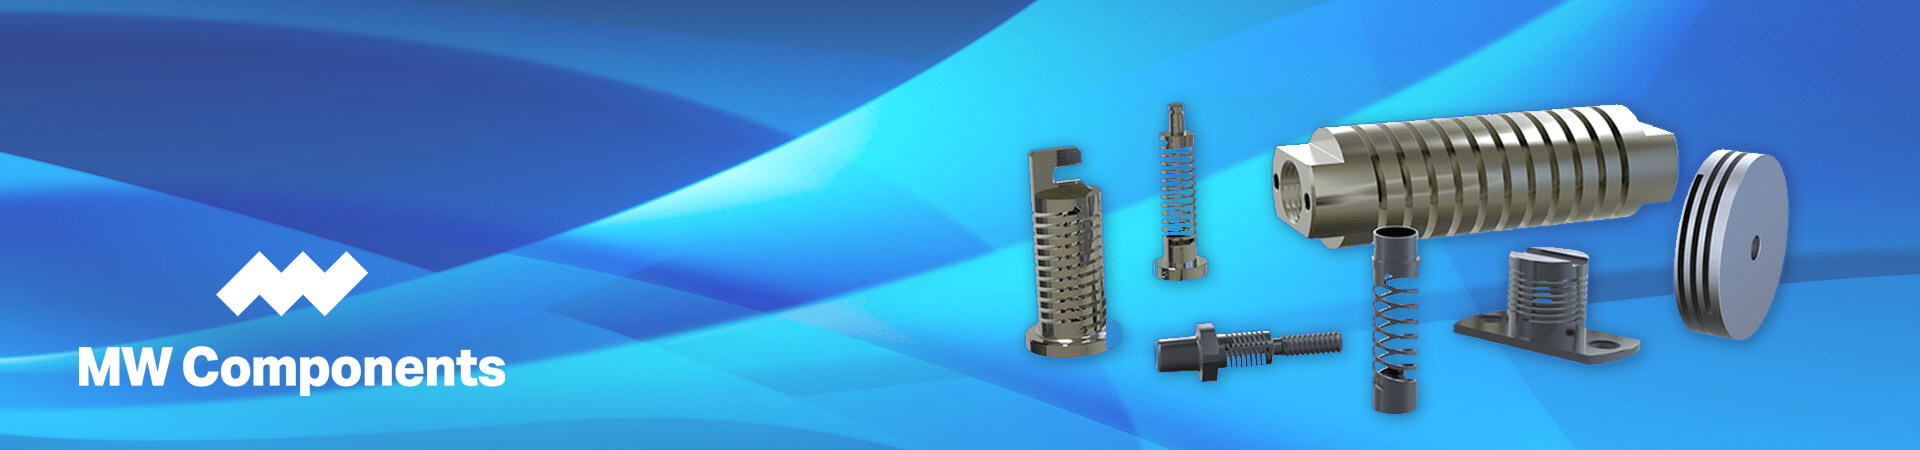 MW Components